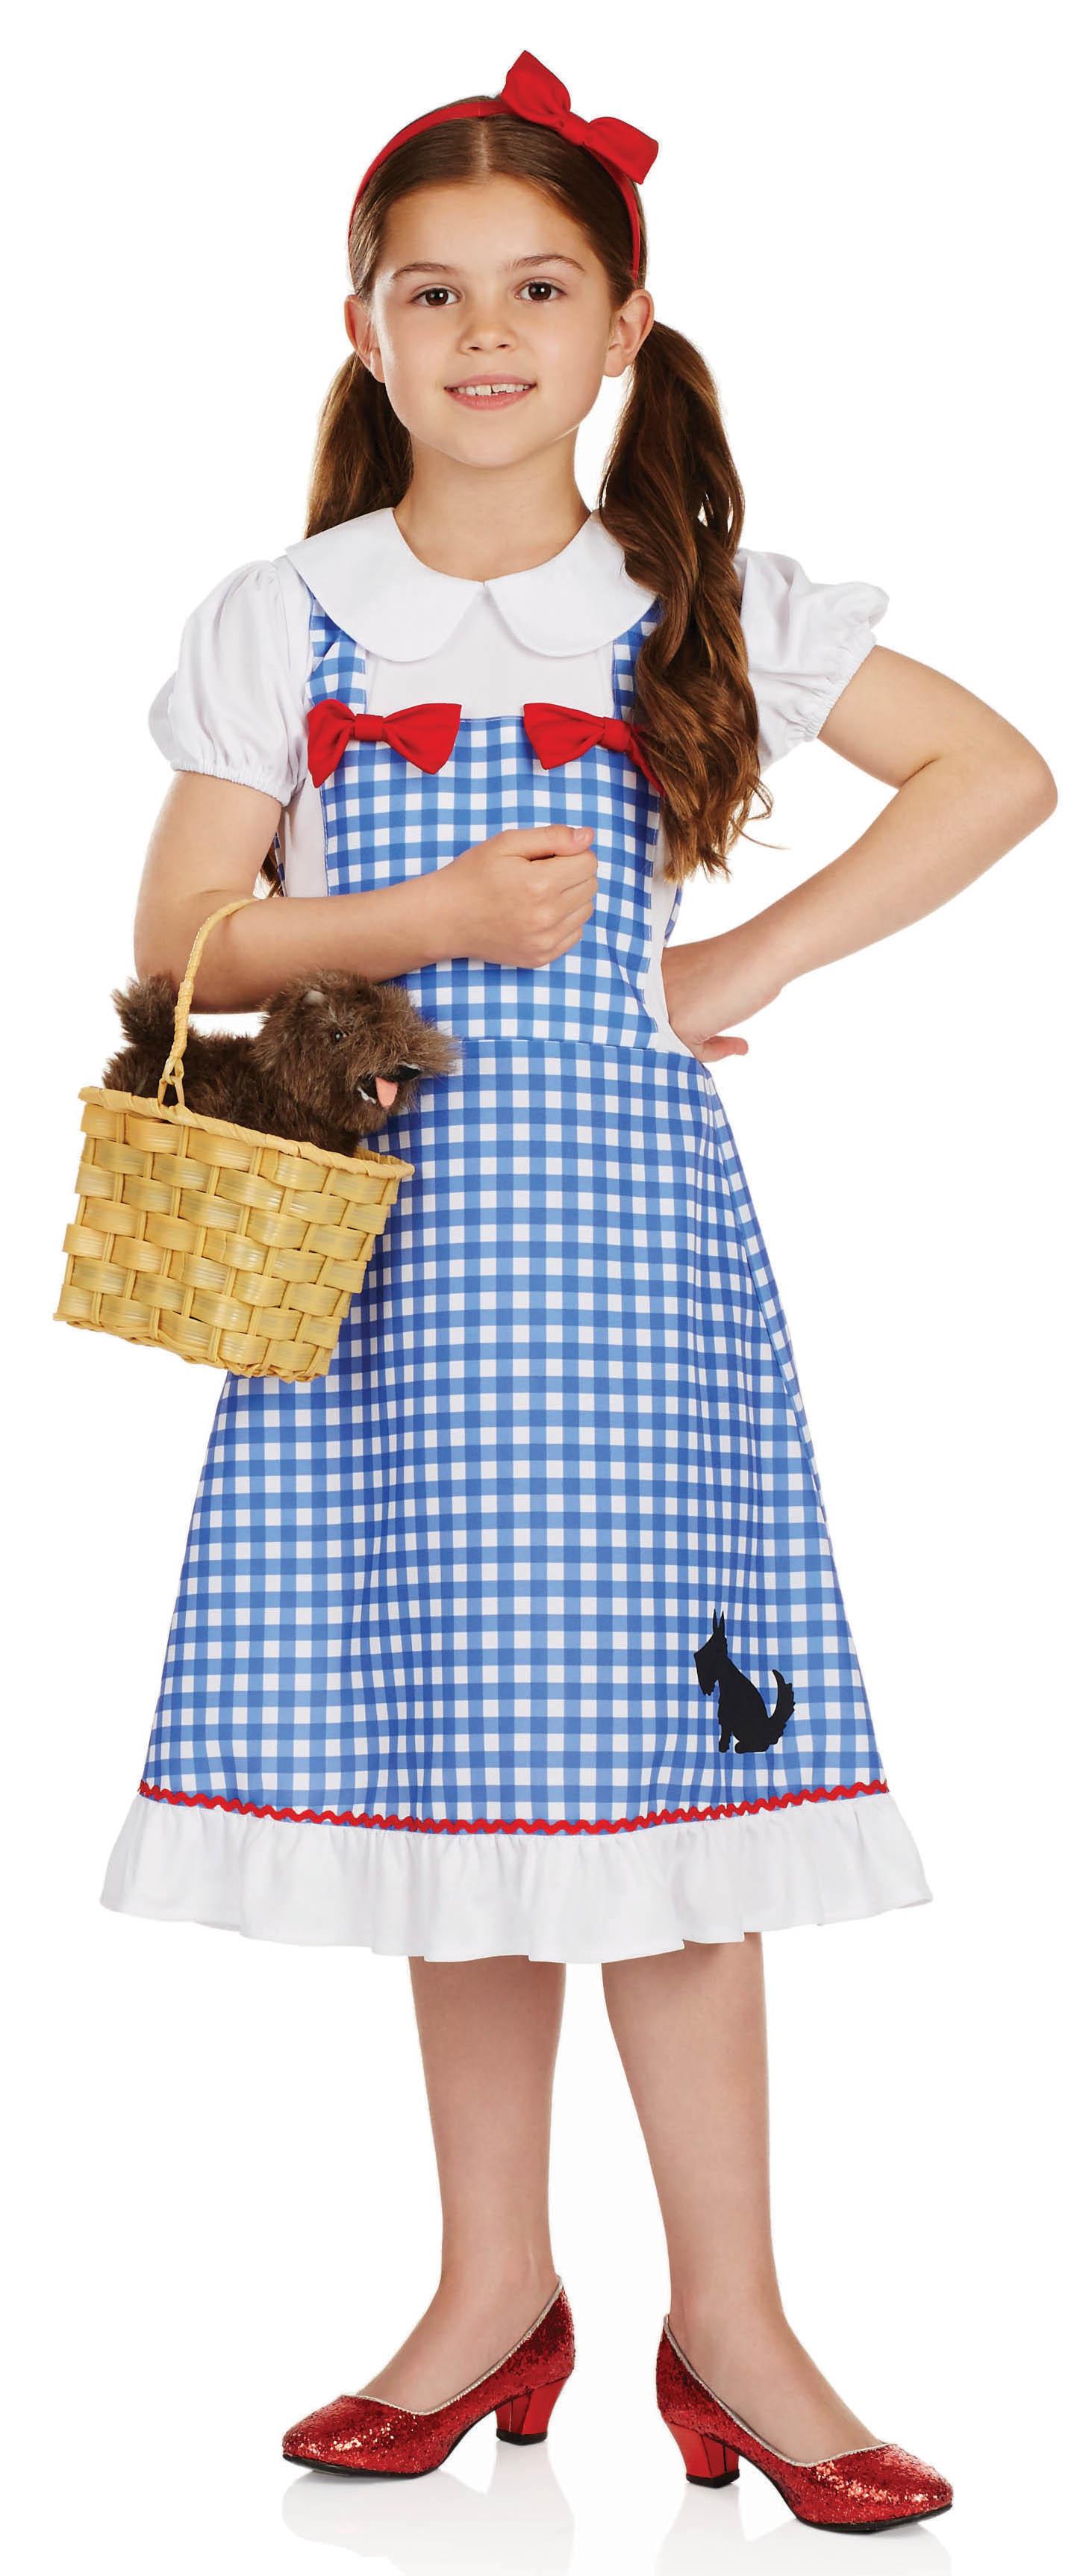 2d6ccf6d5d7 Dorothy Girls Costume